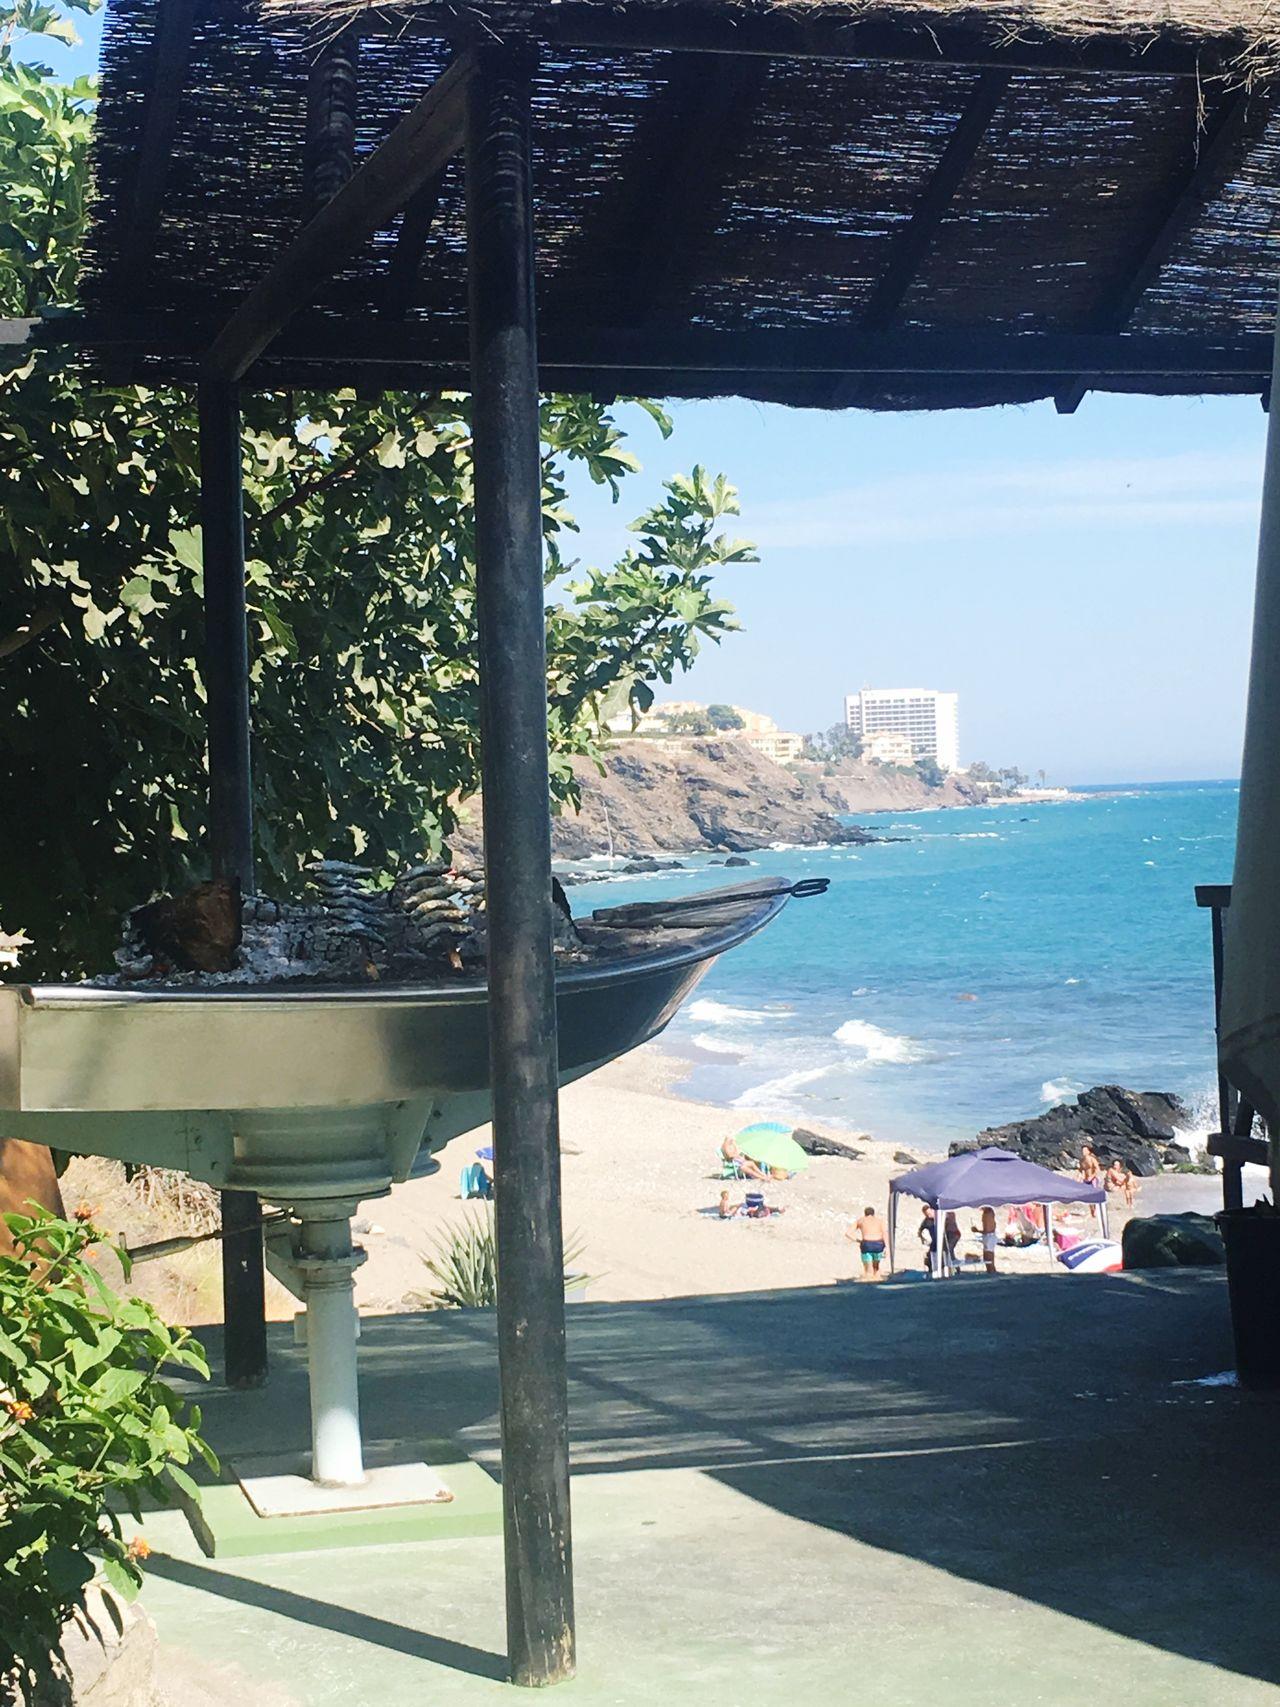 Day Sea Sunlight No People Sky Summer #summertime #sun #hot #sunny #warm #fun #beautiful #sky #clearskys #season #seasons #instagood #instasummer #photooftheday #nature #TFLers #clearsky #bluesky #vacationtime #weather #summerweather #sunshine #summertimeshine Summer Beach Sardinas Sardinero